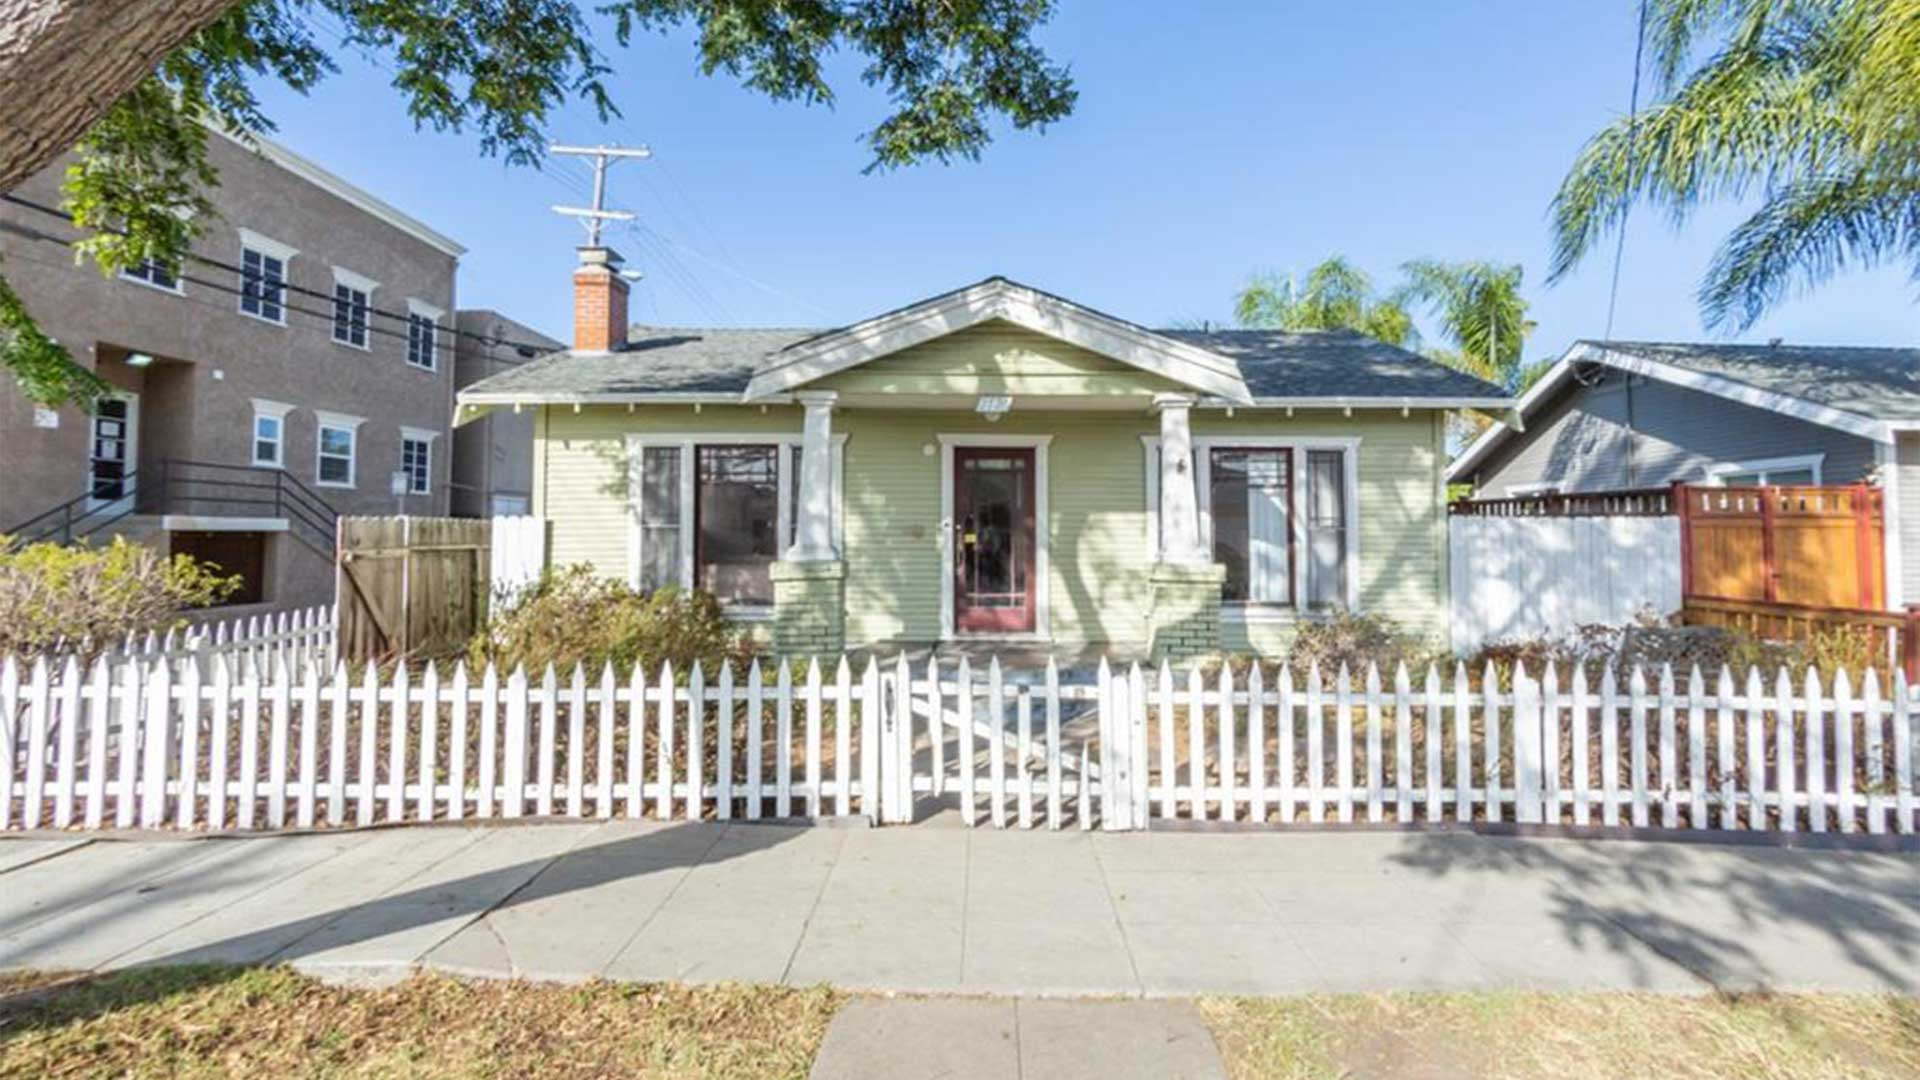 2726 Madison Ave. San Diego, CA 92116